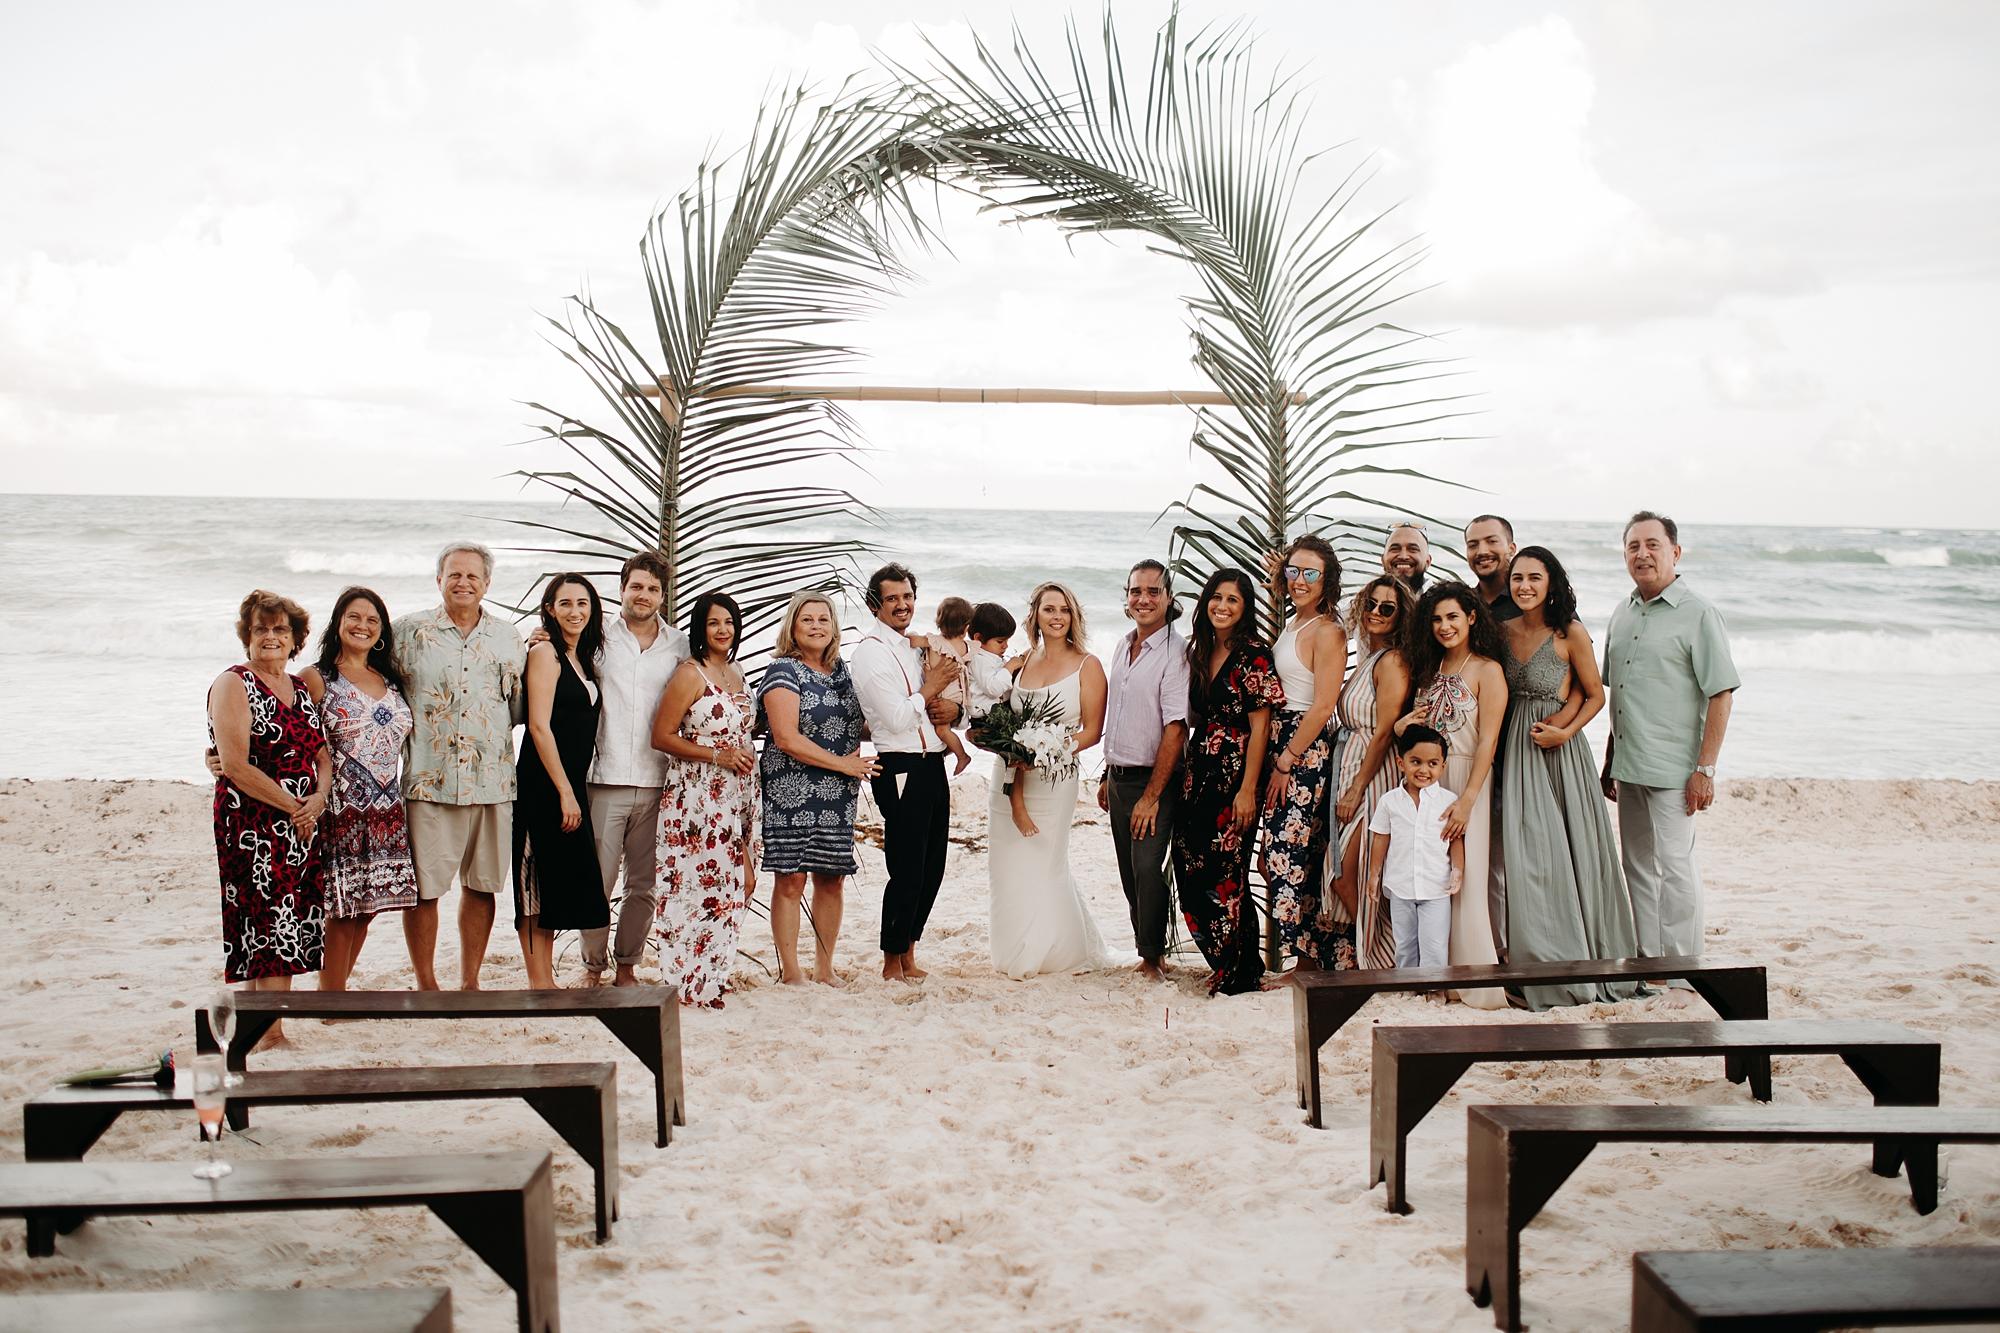 Danielle-San-Antonio-Wedding-Photographer-193_WEB.jpg